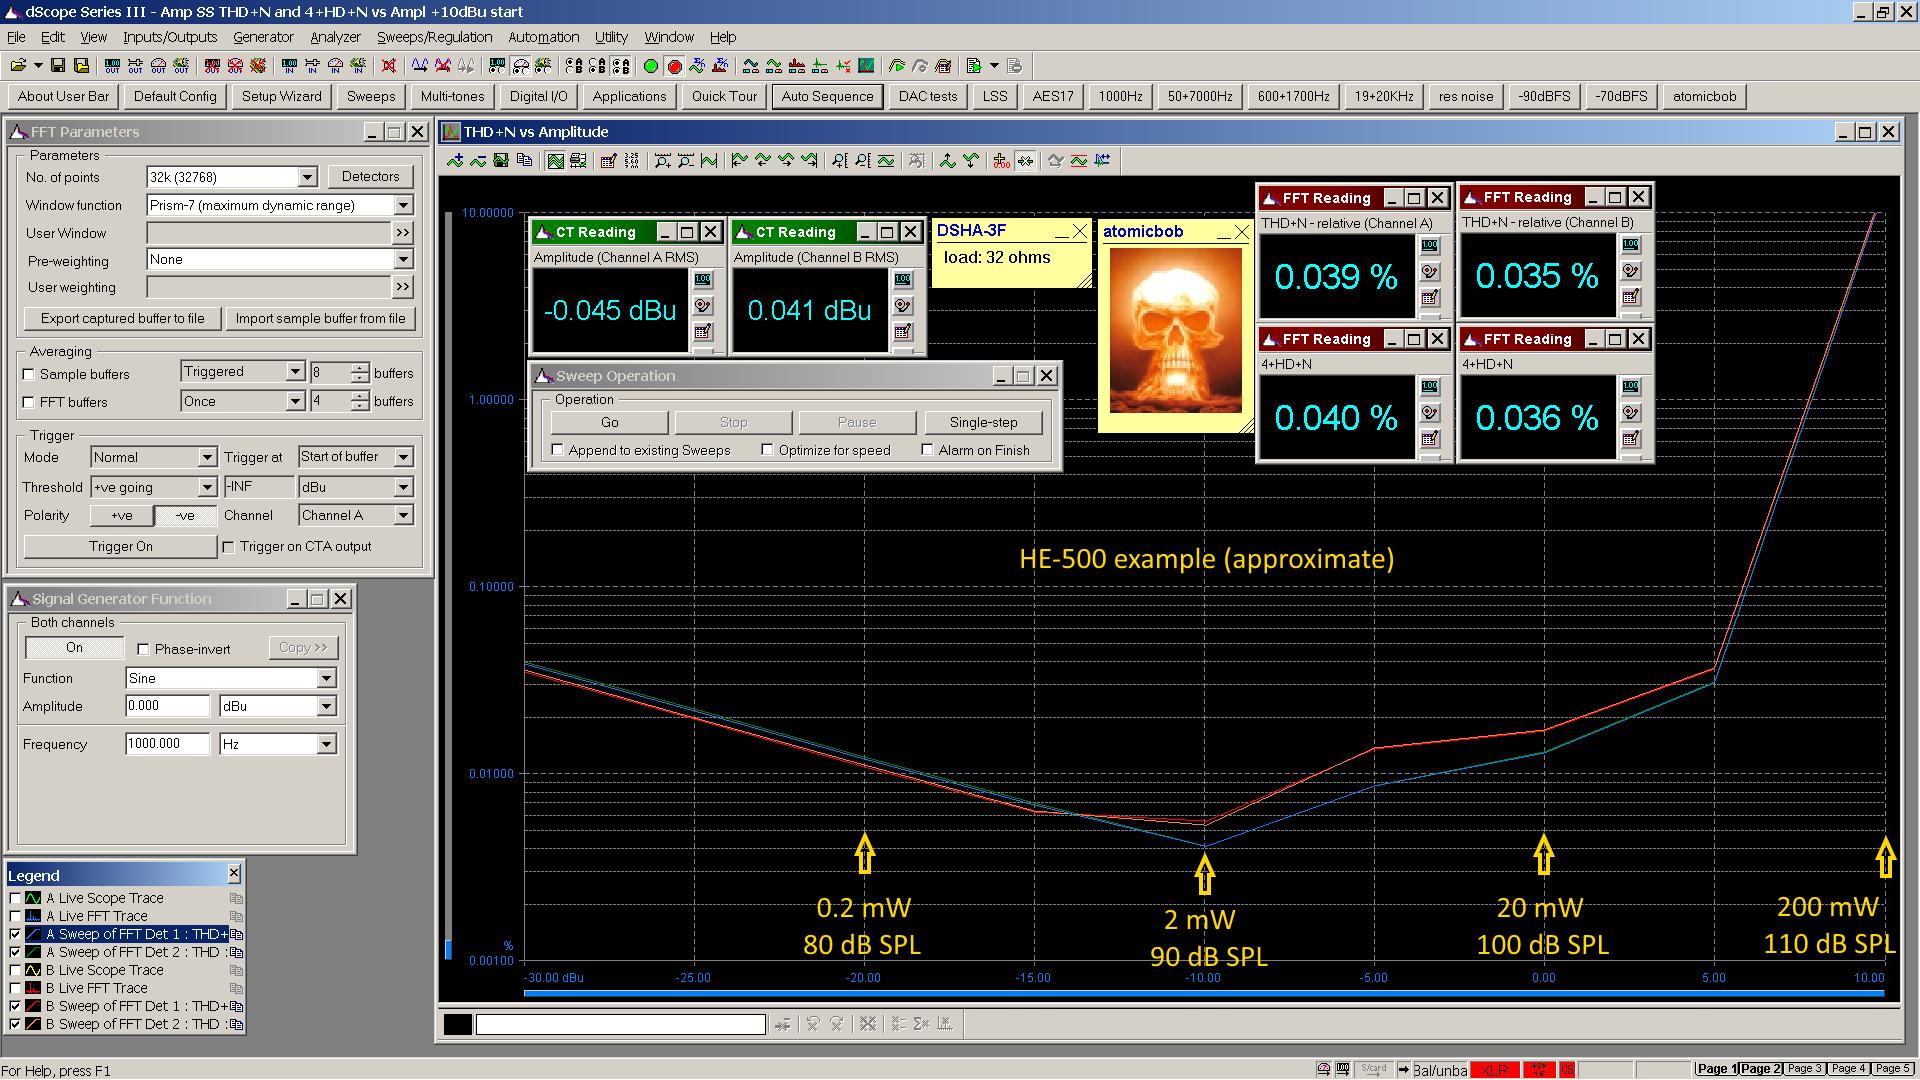 20191021-2 DSHA-3F THD+N  nth-HD vs amp 32R - annotated HE-500.png